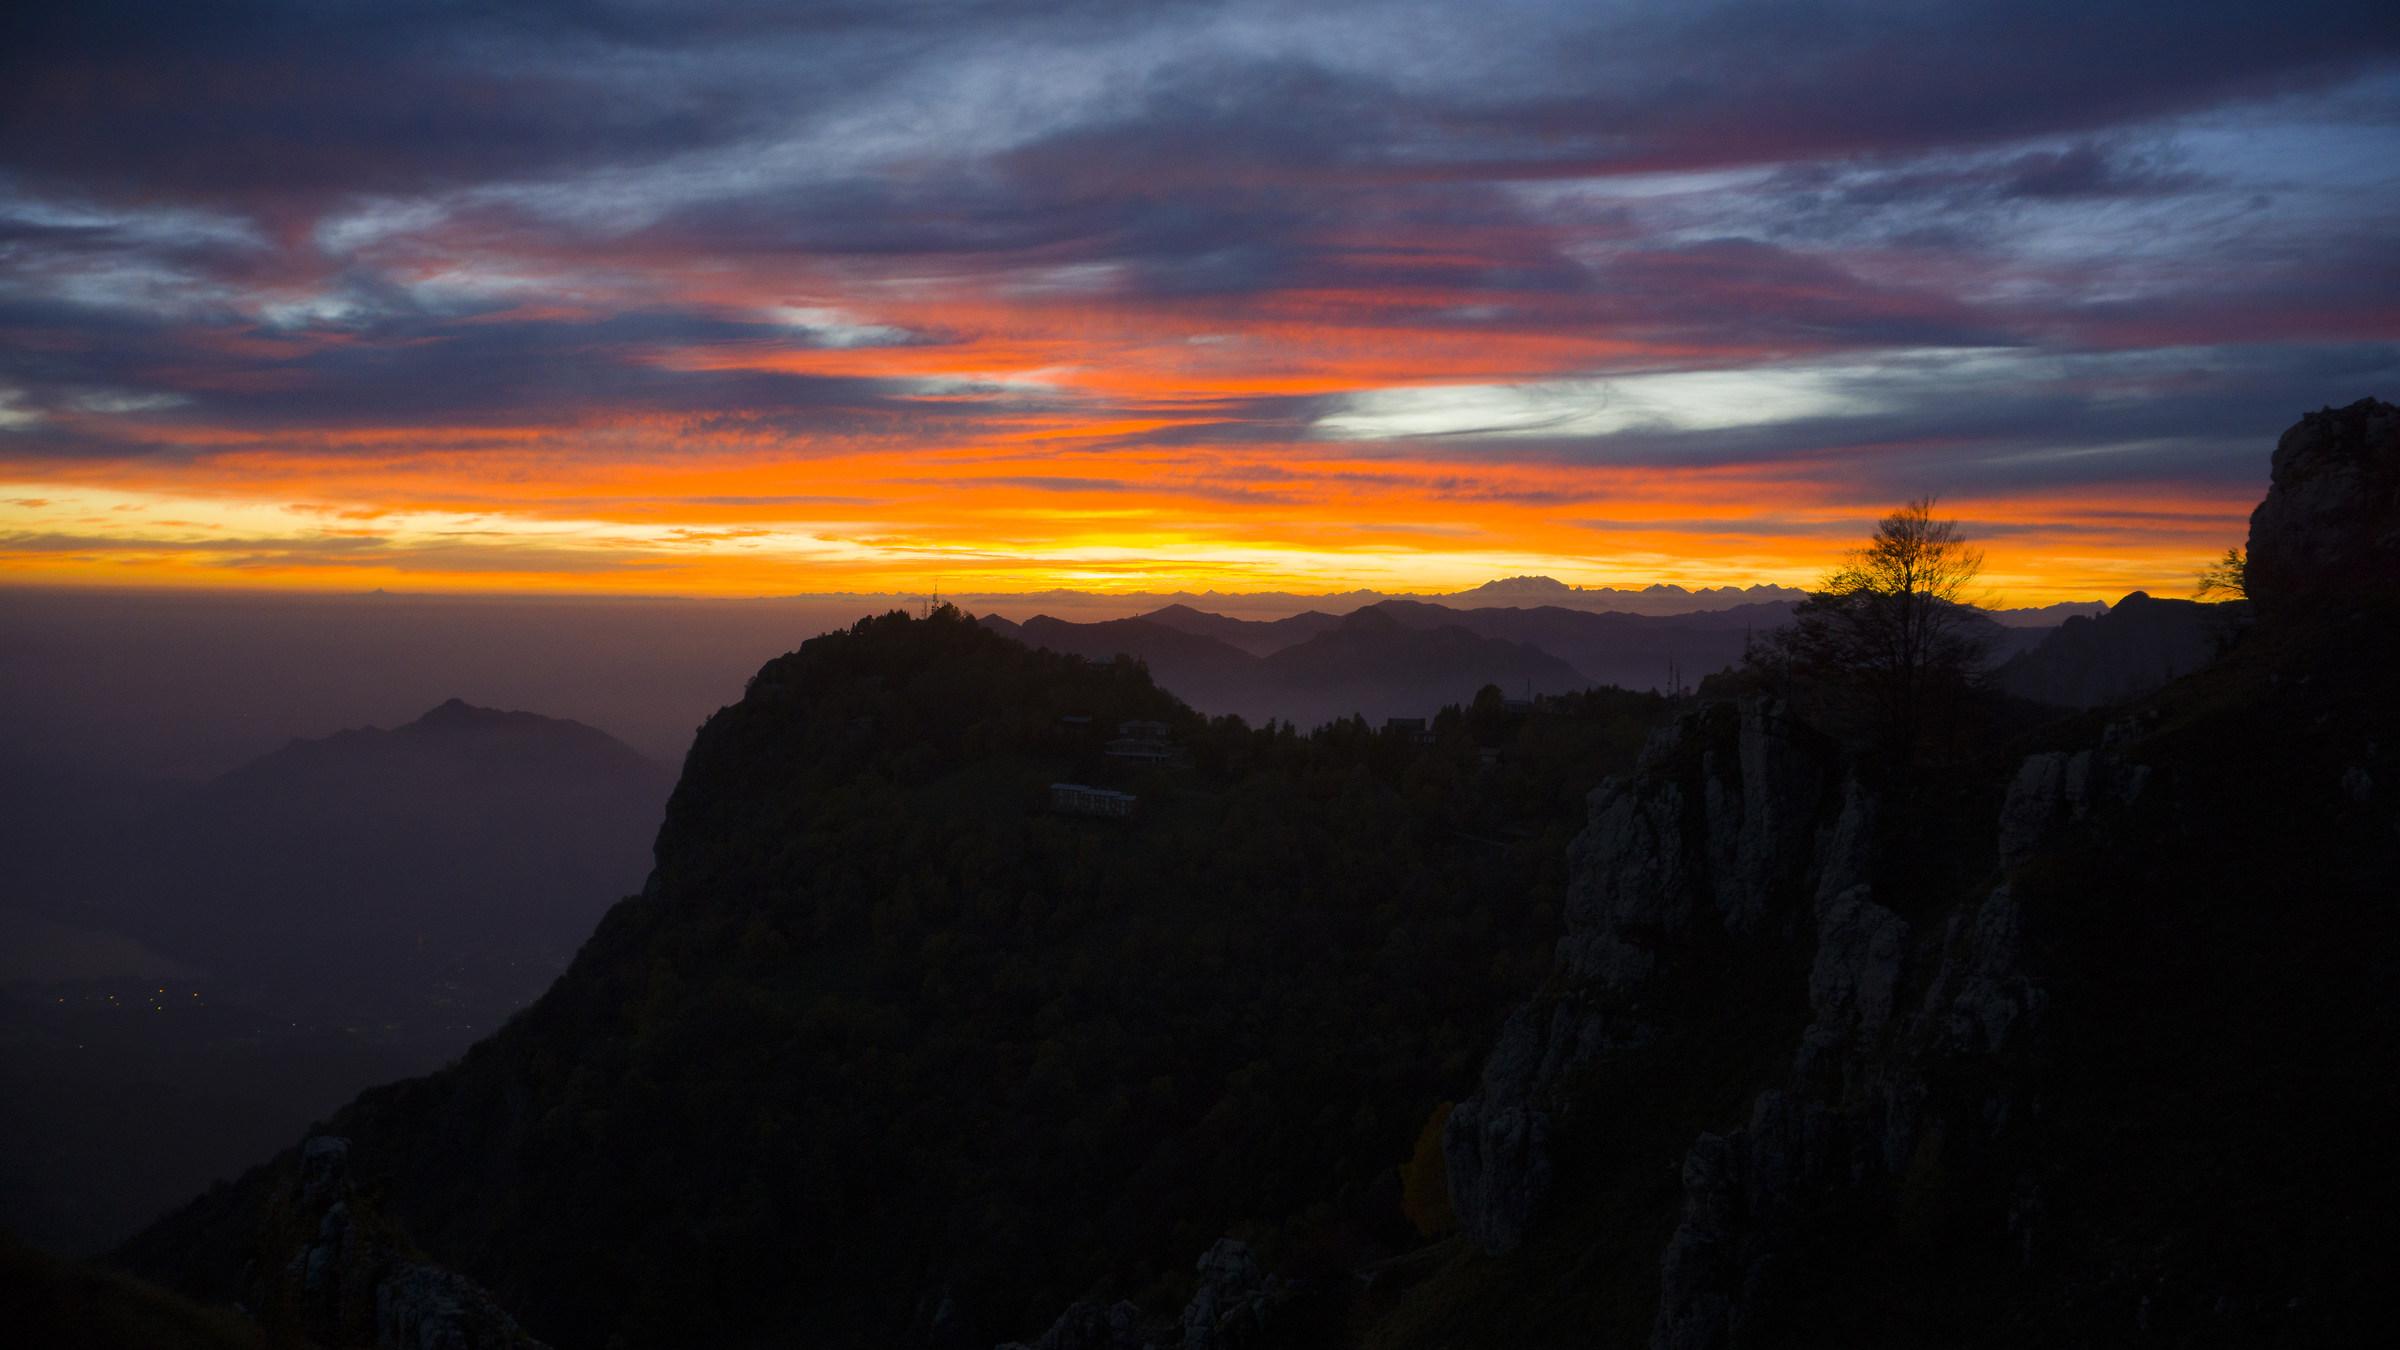 tramonto al rifugio...